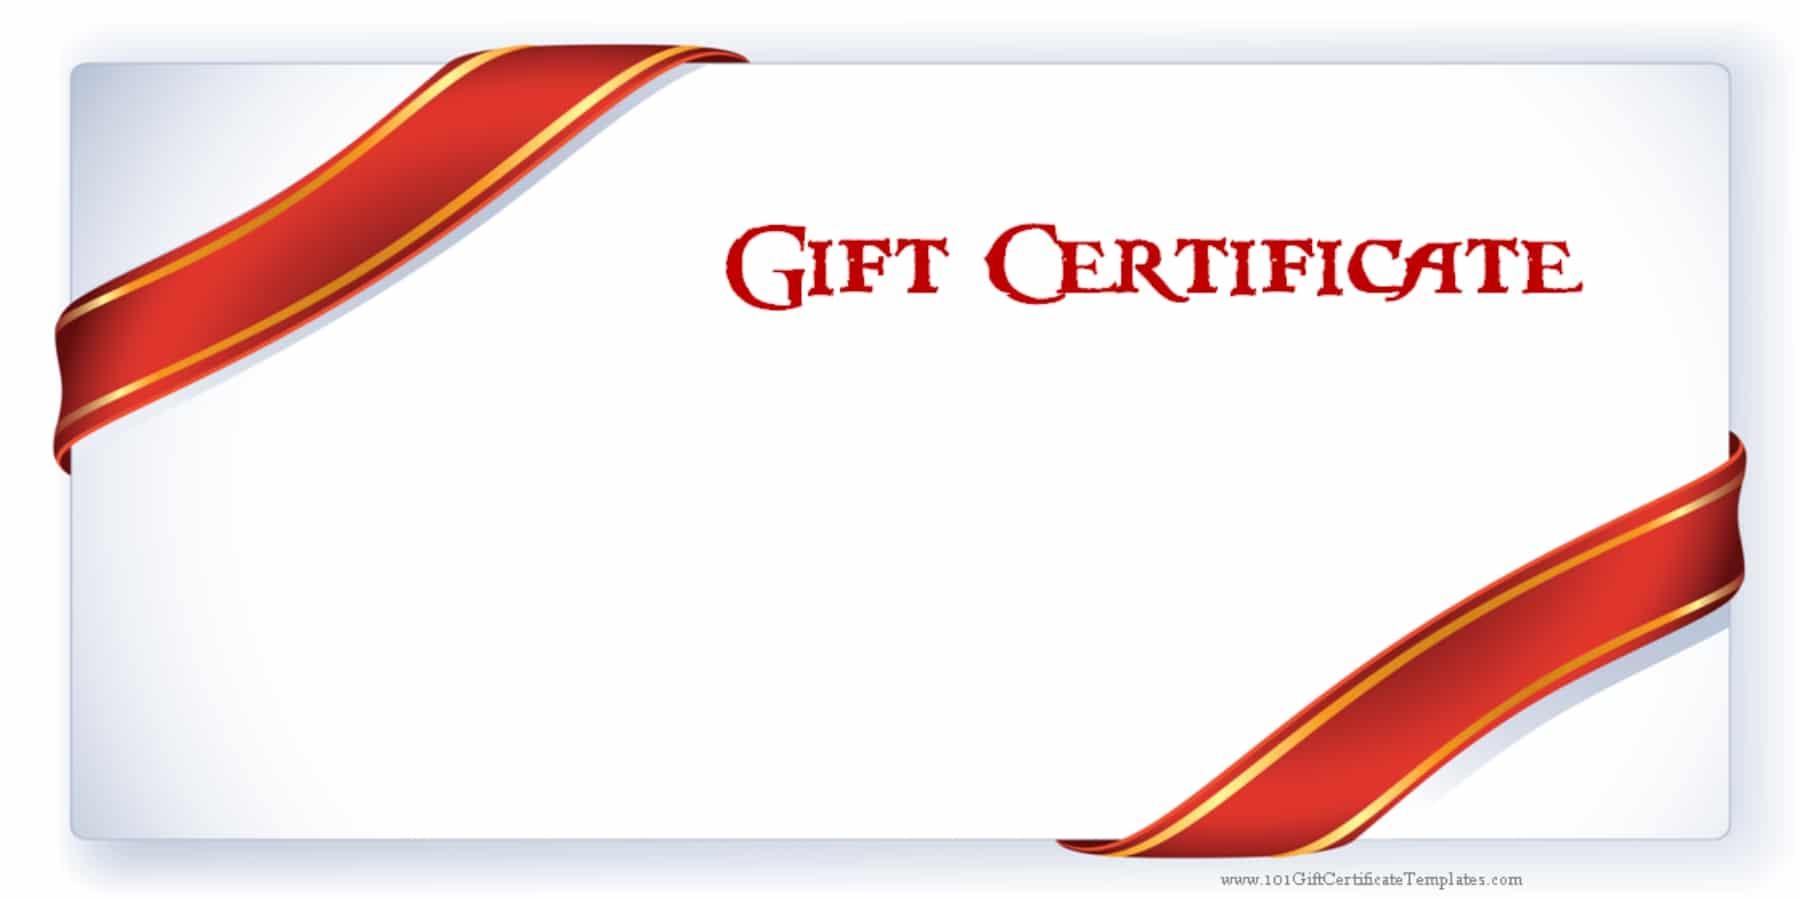 Gift Voucher Marine Aquatics - 100 gift certificate template